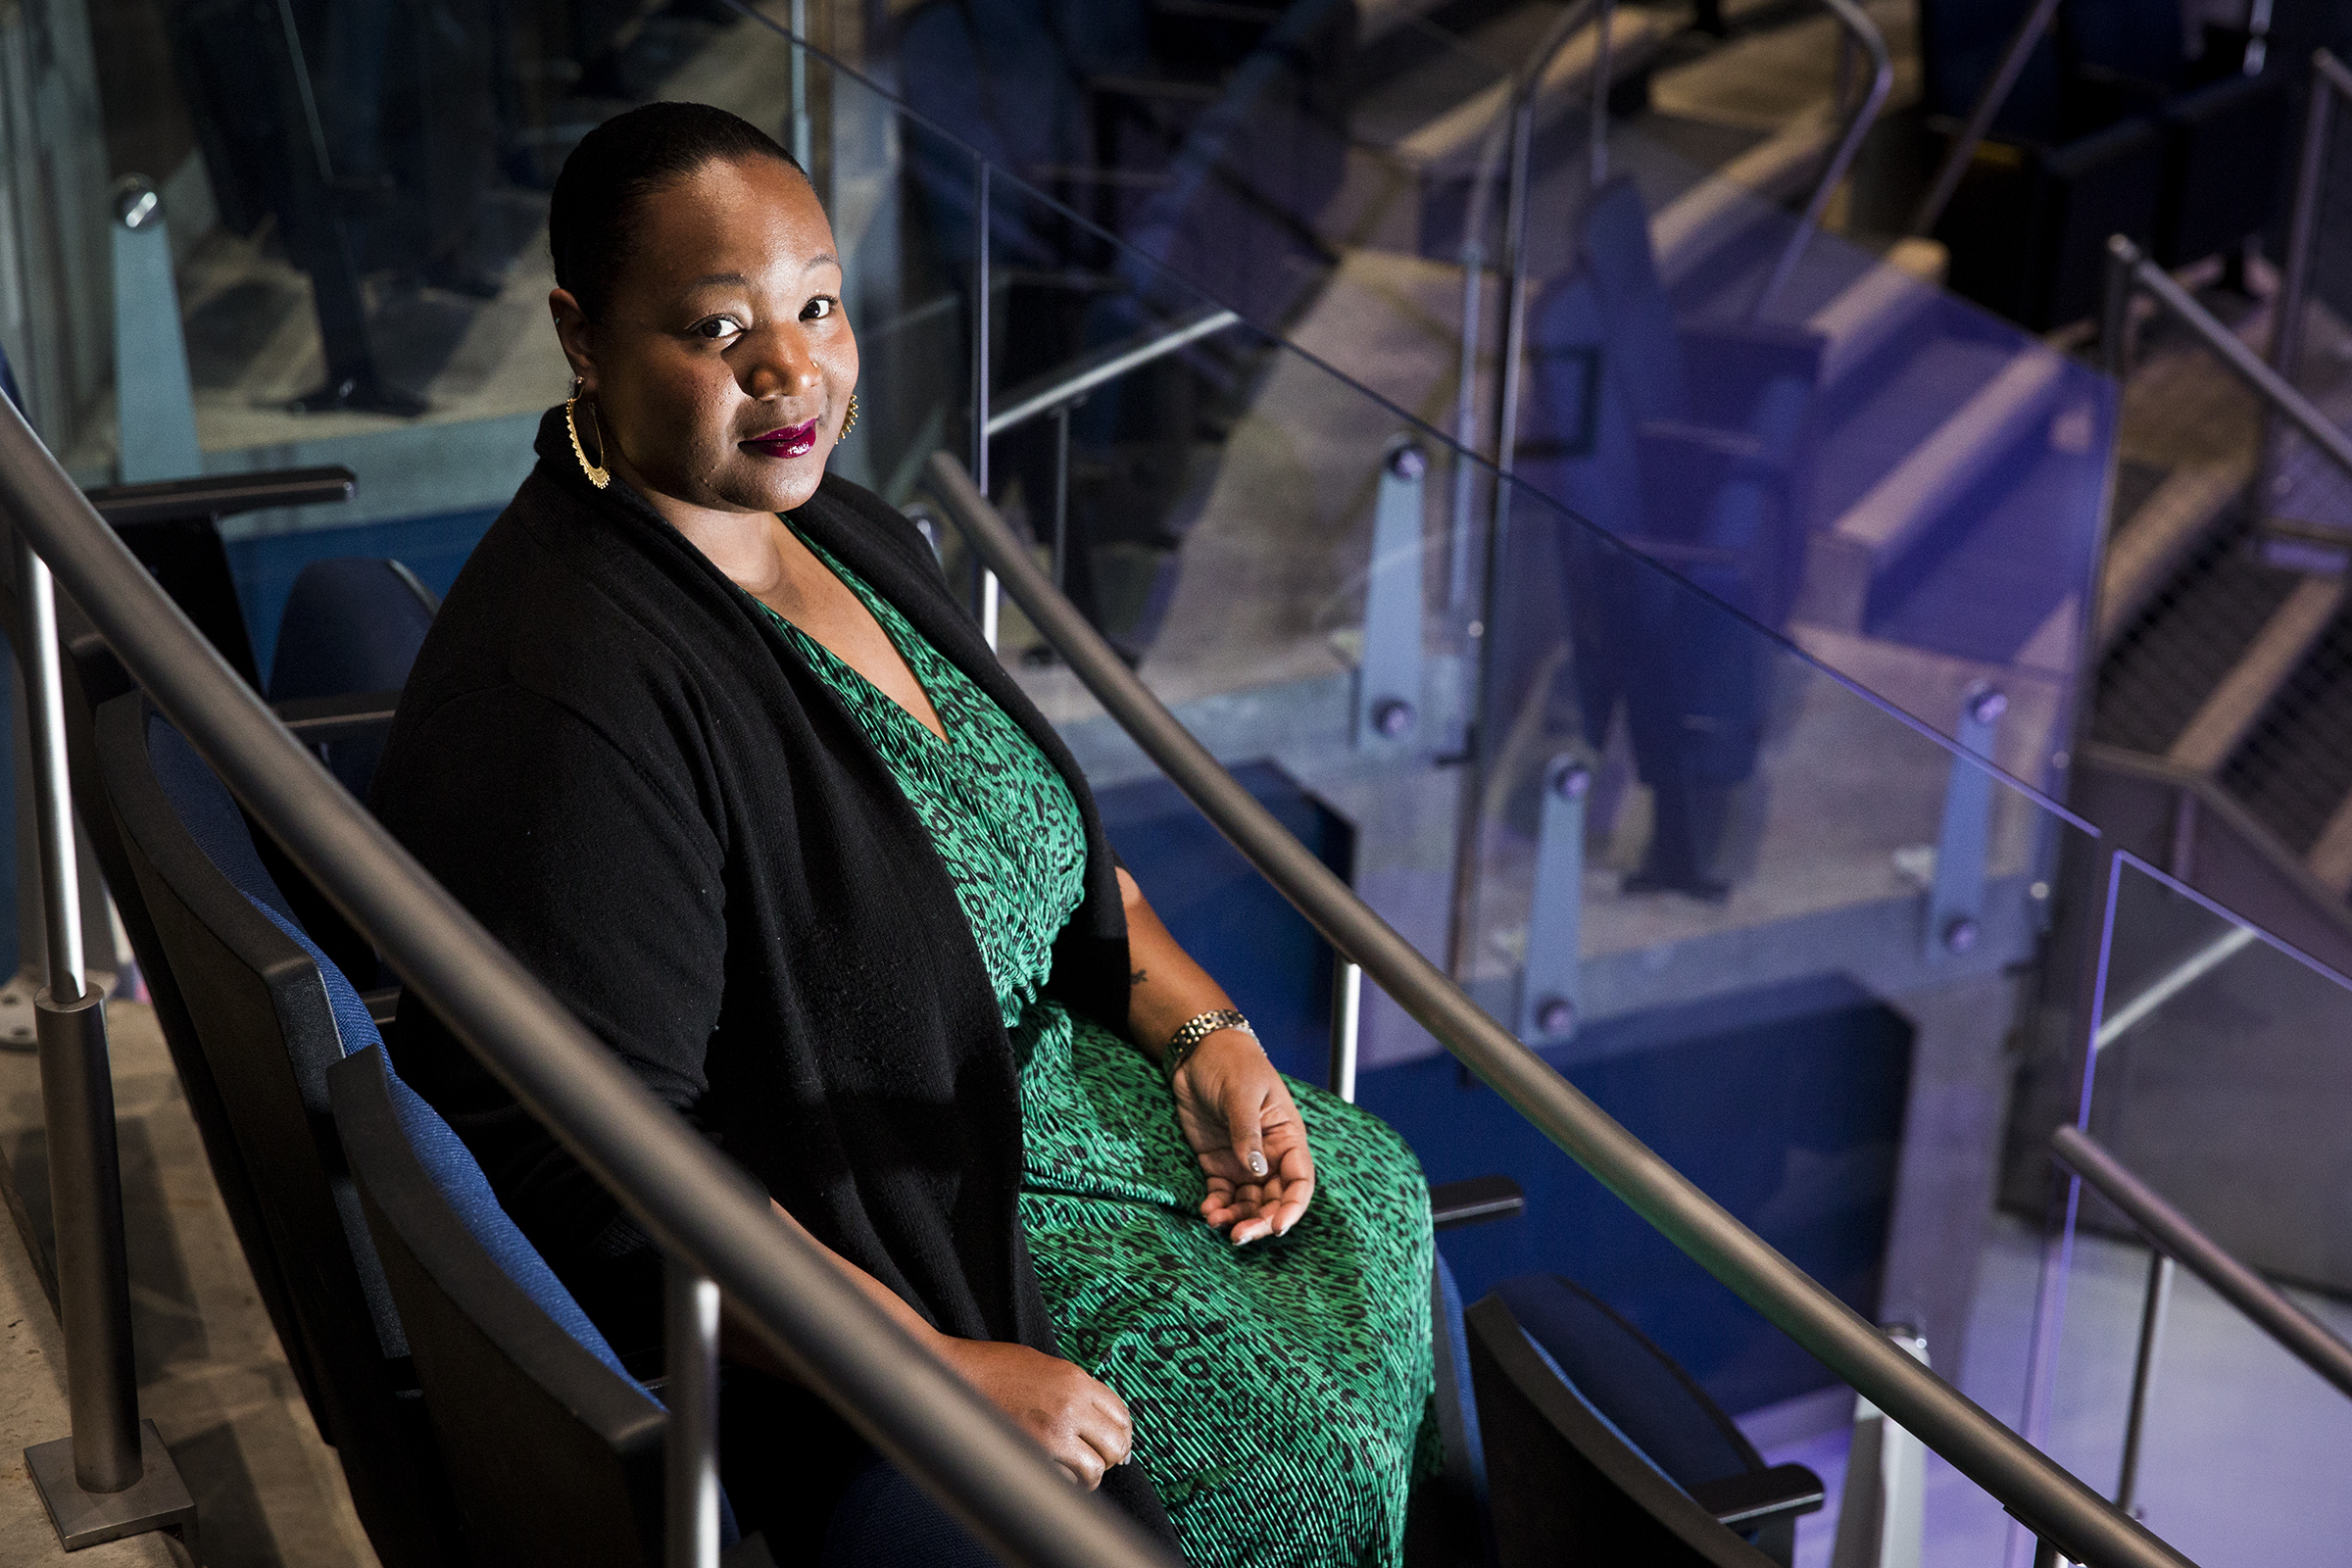 Maori Karmael Holmes, founder and executive director of BlackStar Film Festival